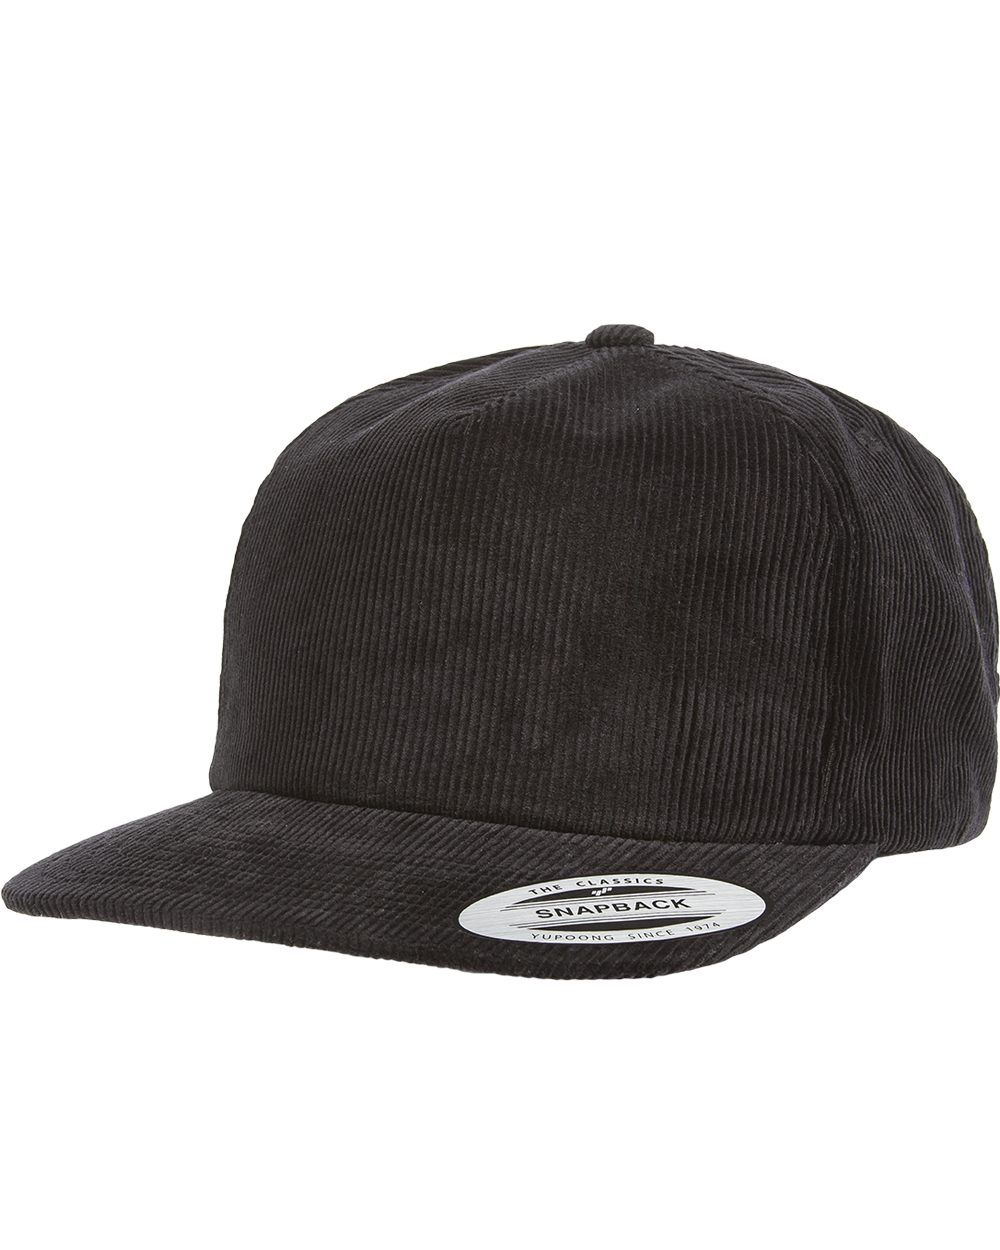 Yupoong 6508 - Premium Corduroy Snapback Cap